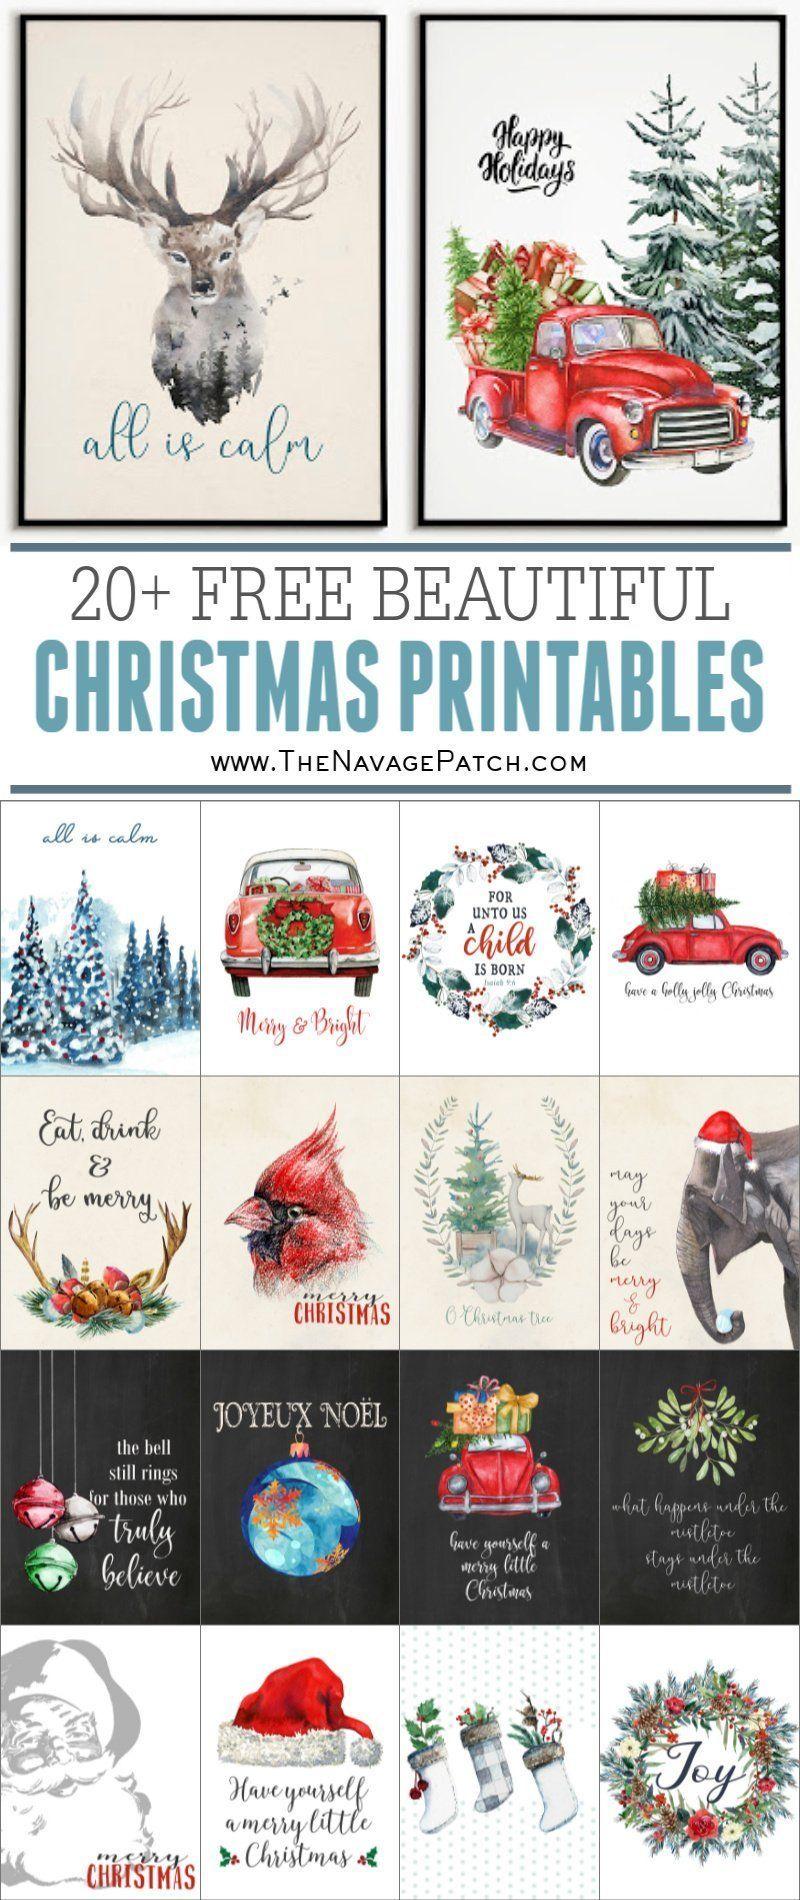 Beautiful FREE Watercolor Christmas Printables